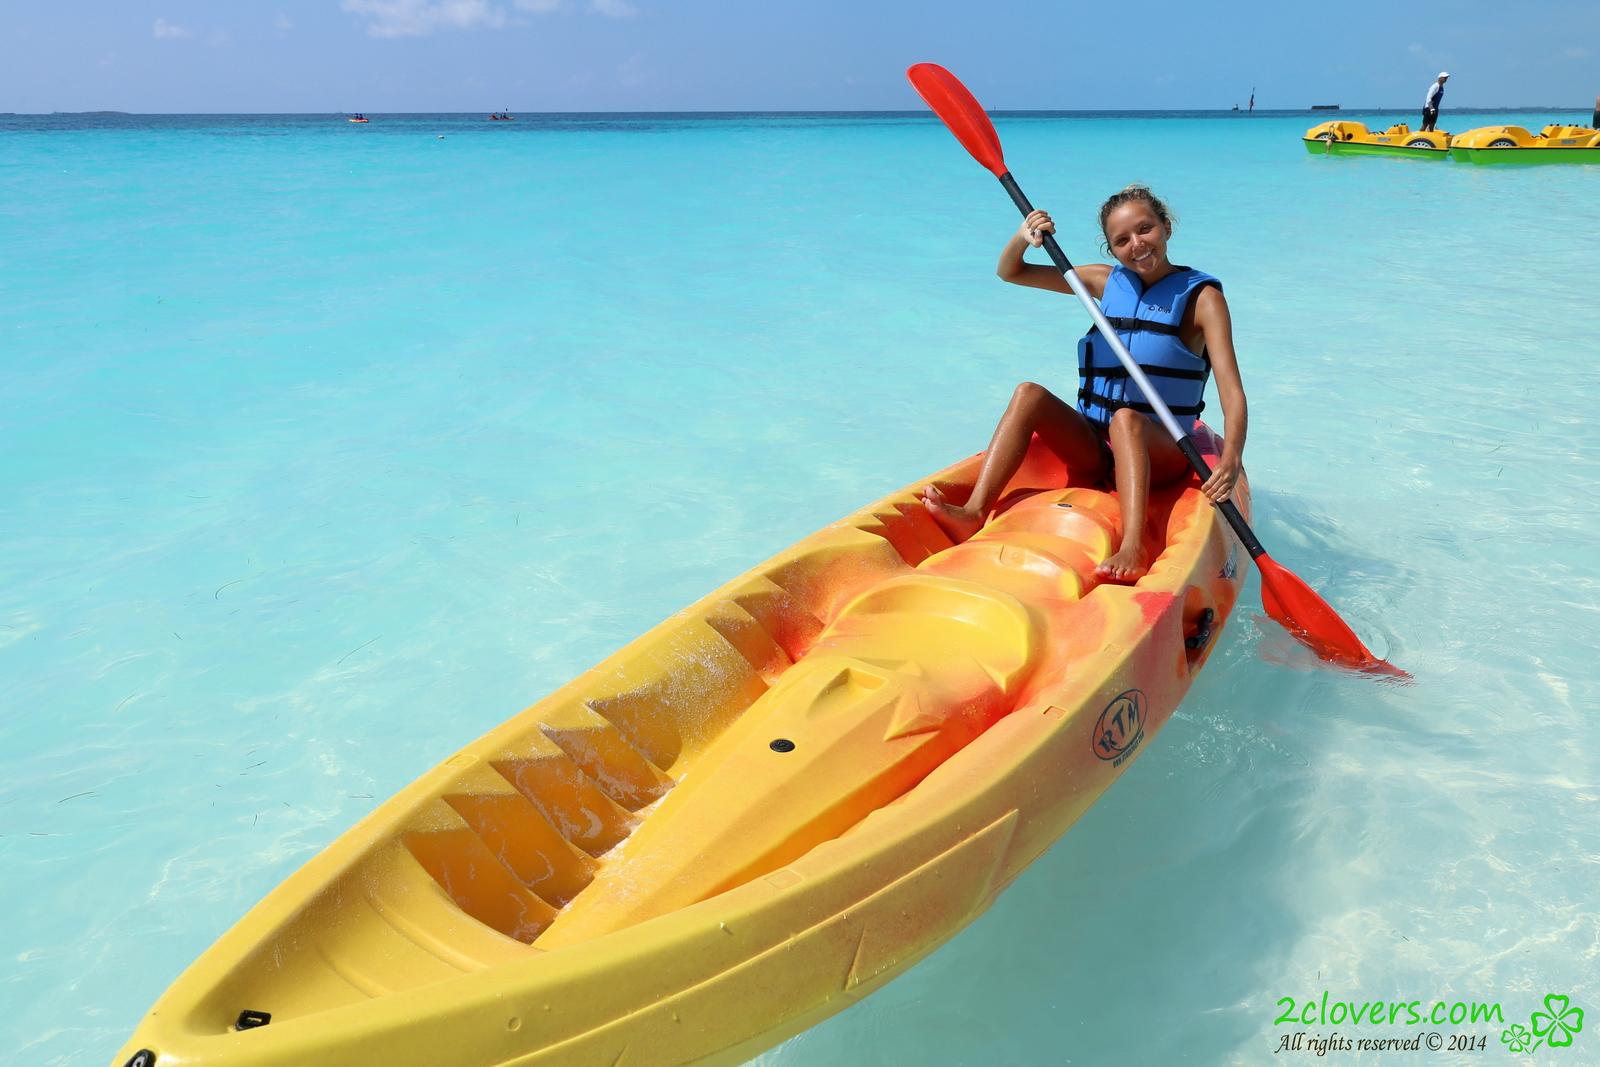 katya-clover-naked-on-sirena-beach-seaside-2clovers-01